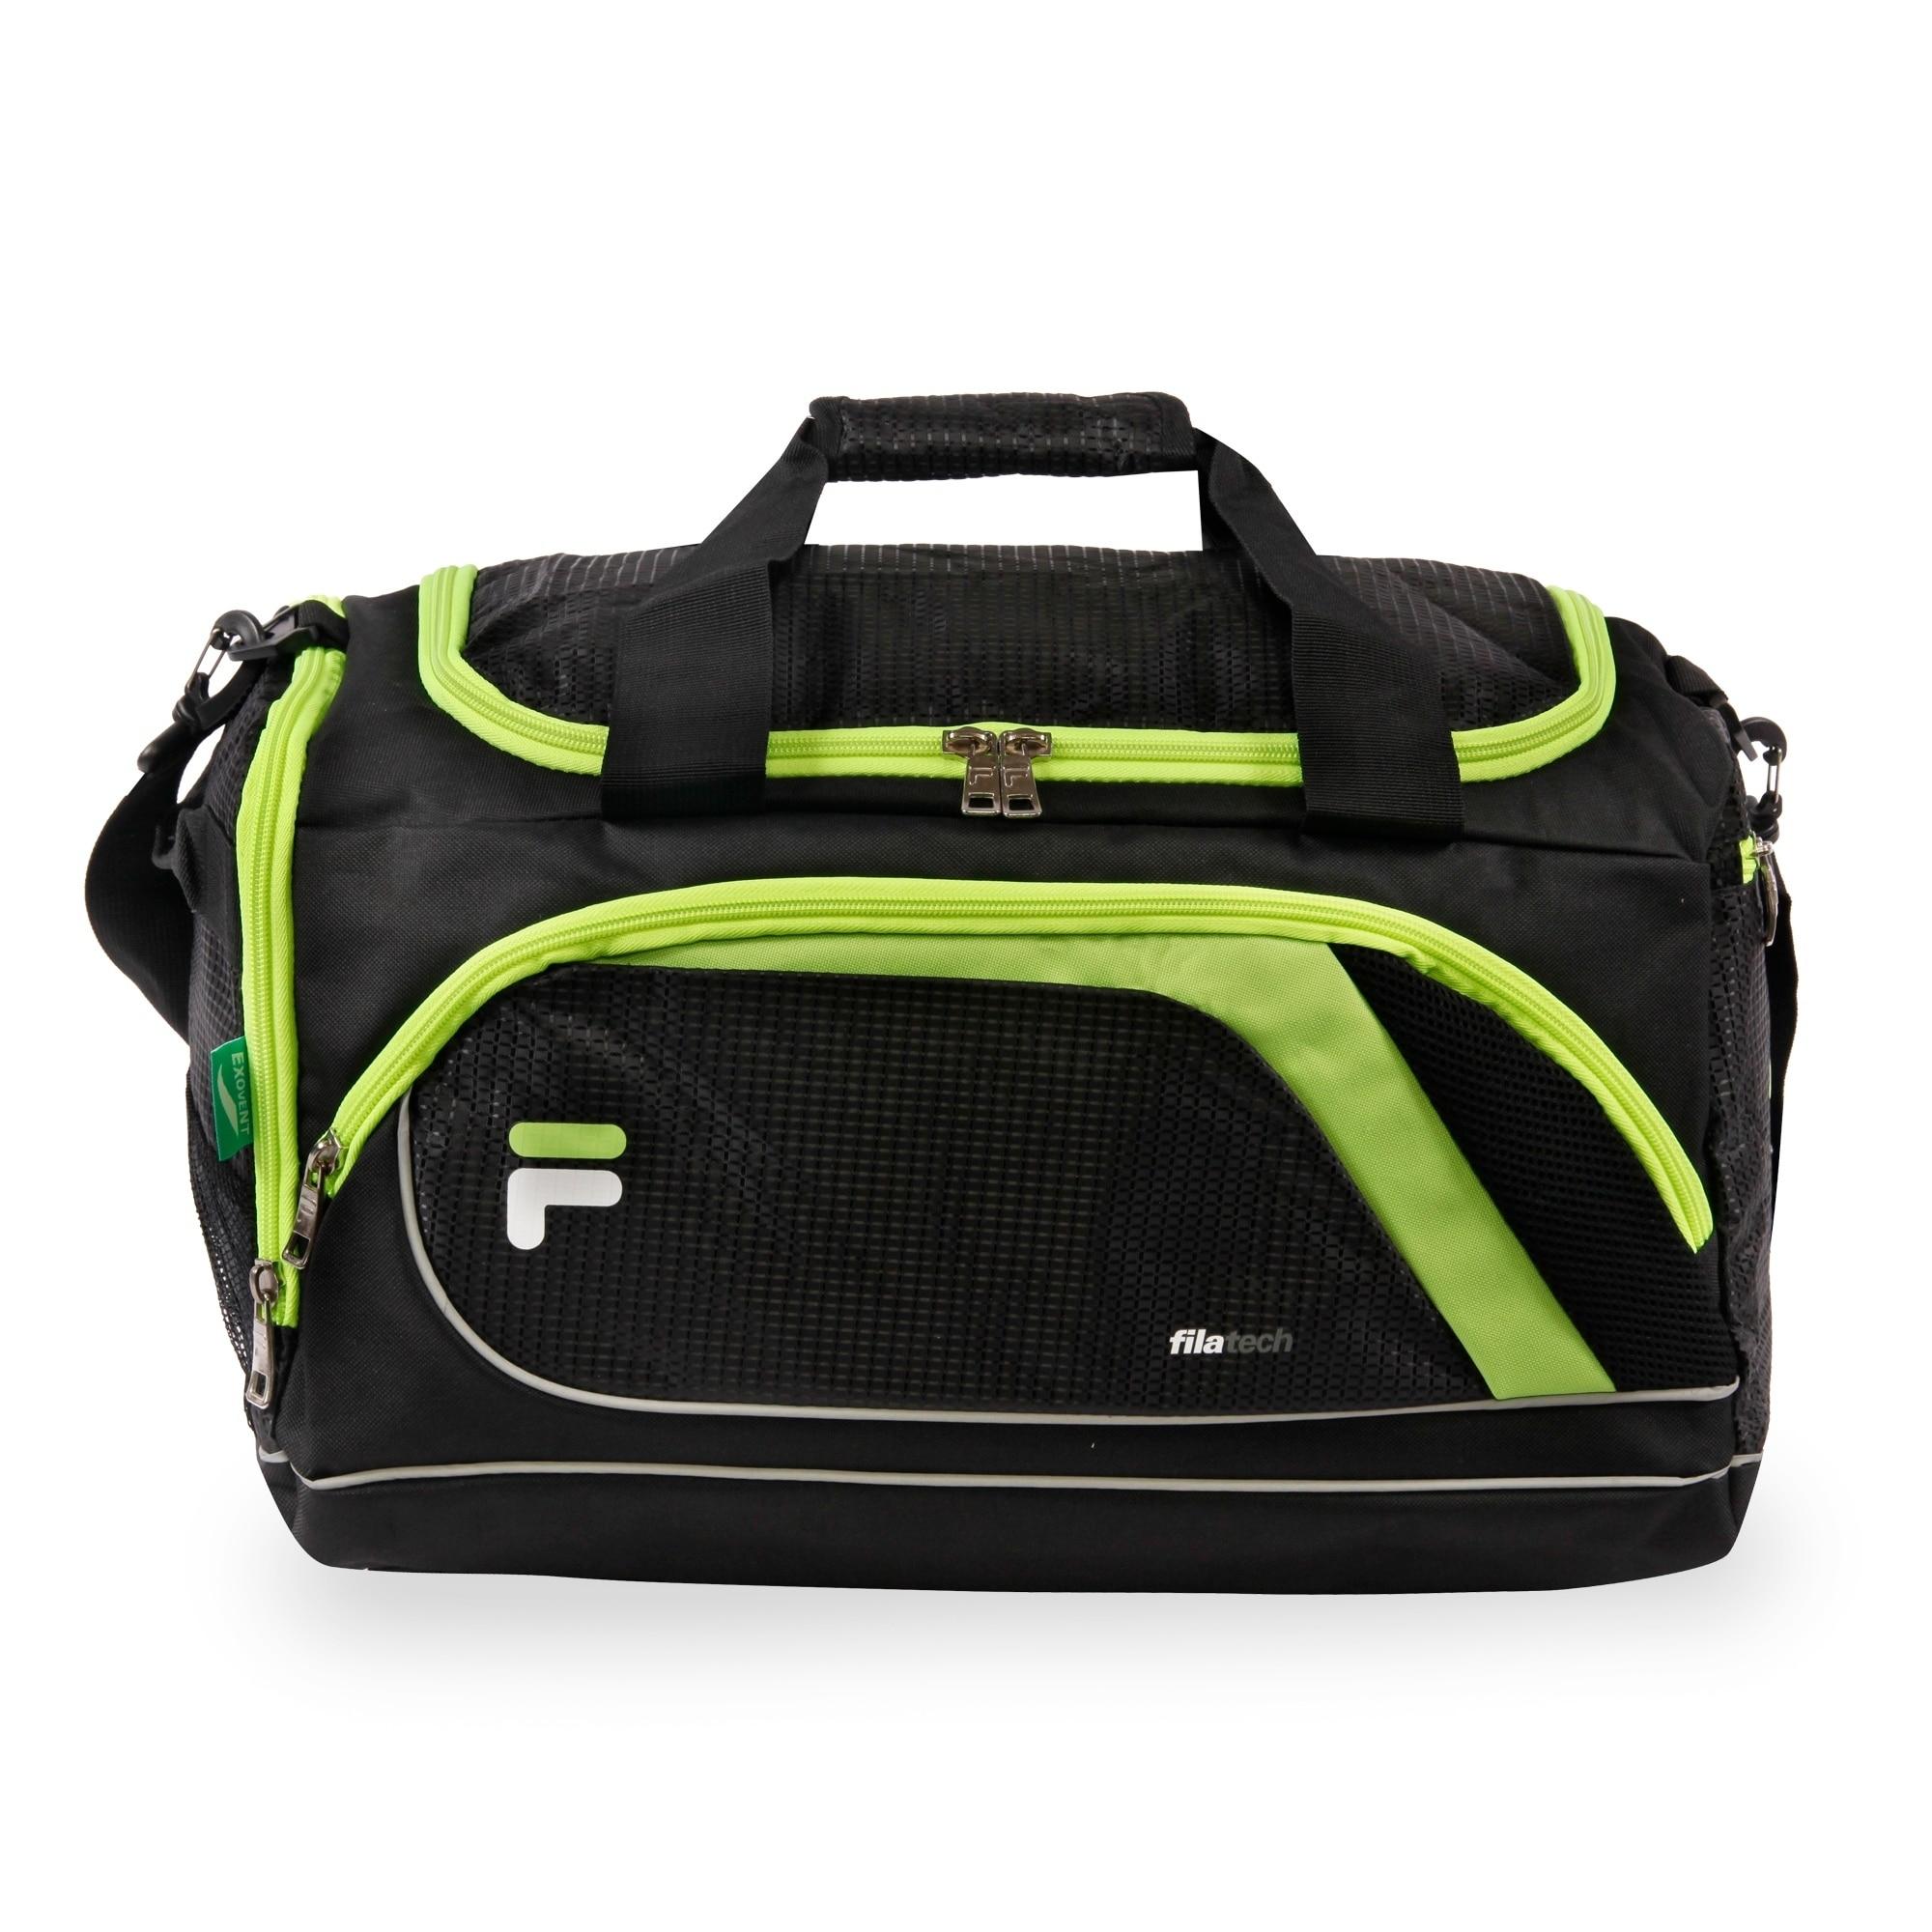 8181e451fb93 Shop Fila Advantage Small Sport Duffel Bag with Shoe Pocket - Free ...